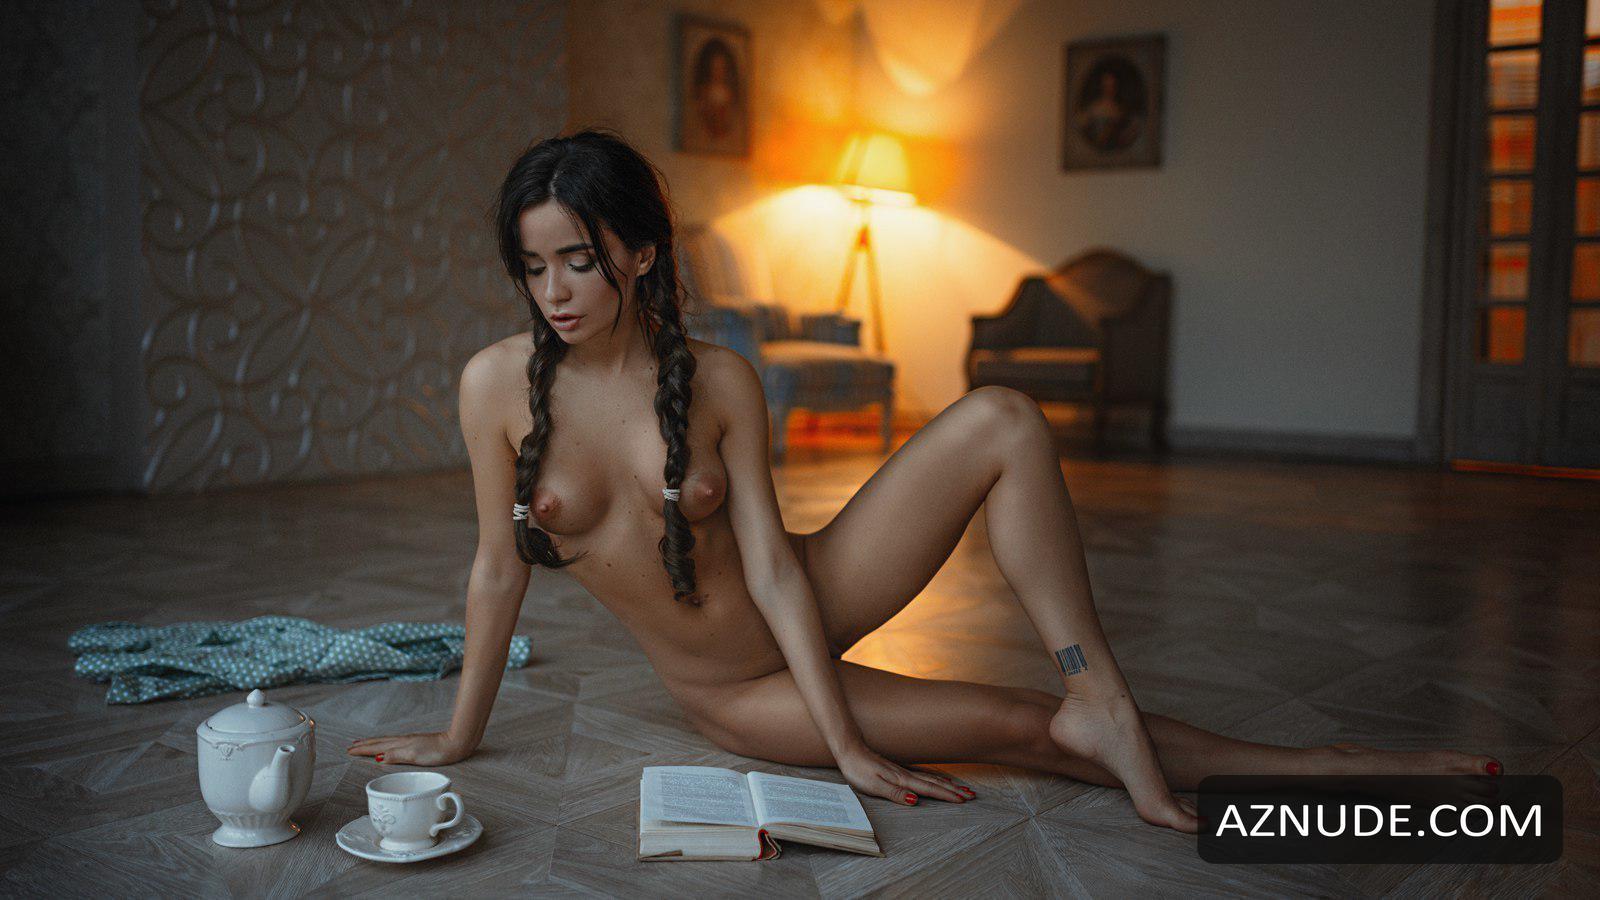 Nude Ekaterina Zueva nude (78 foto and video), Pussy, Paparazzi, Feet, legs 2019